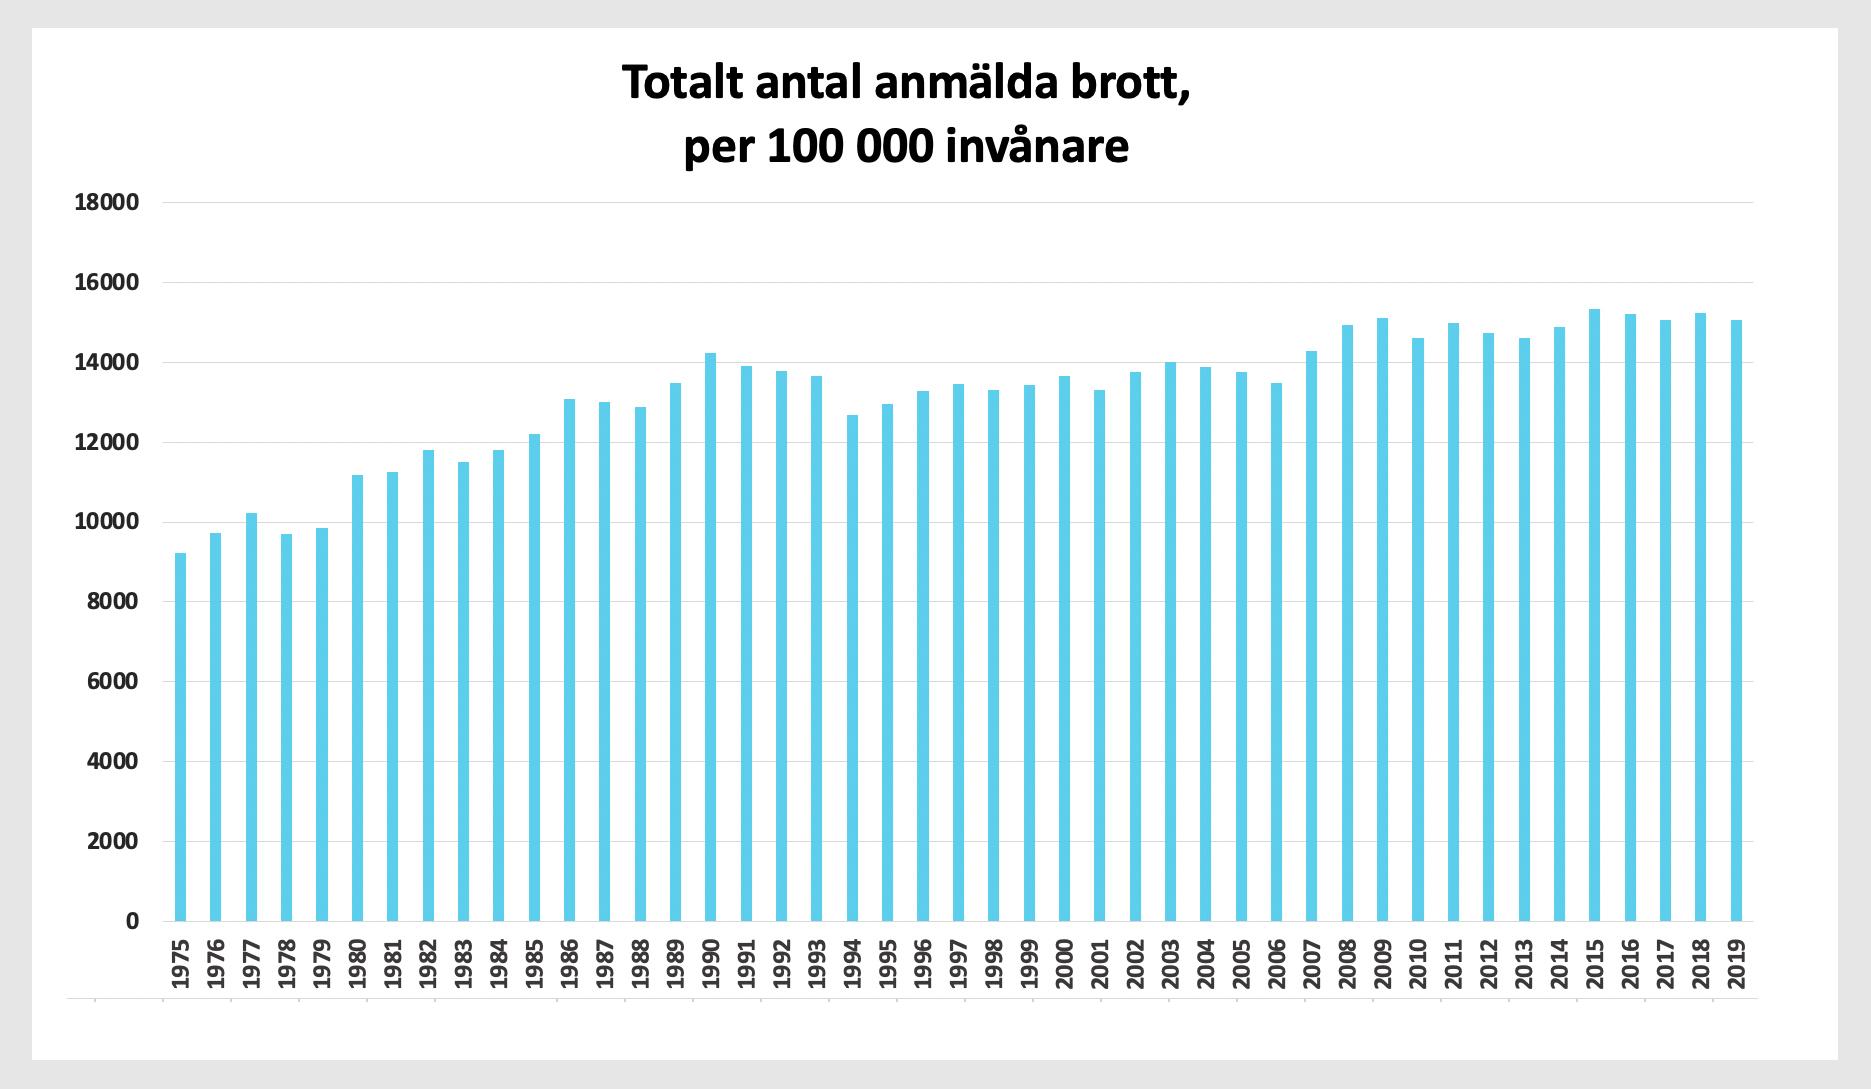 Totalt antal anmälda brott,per 100 000 invånare